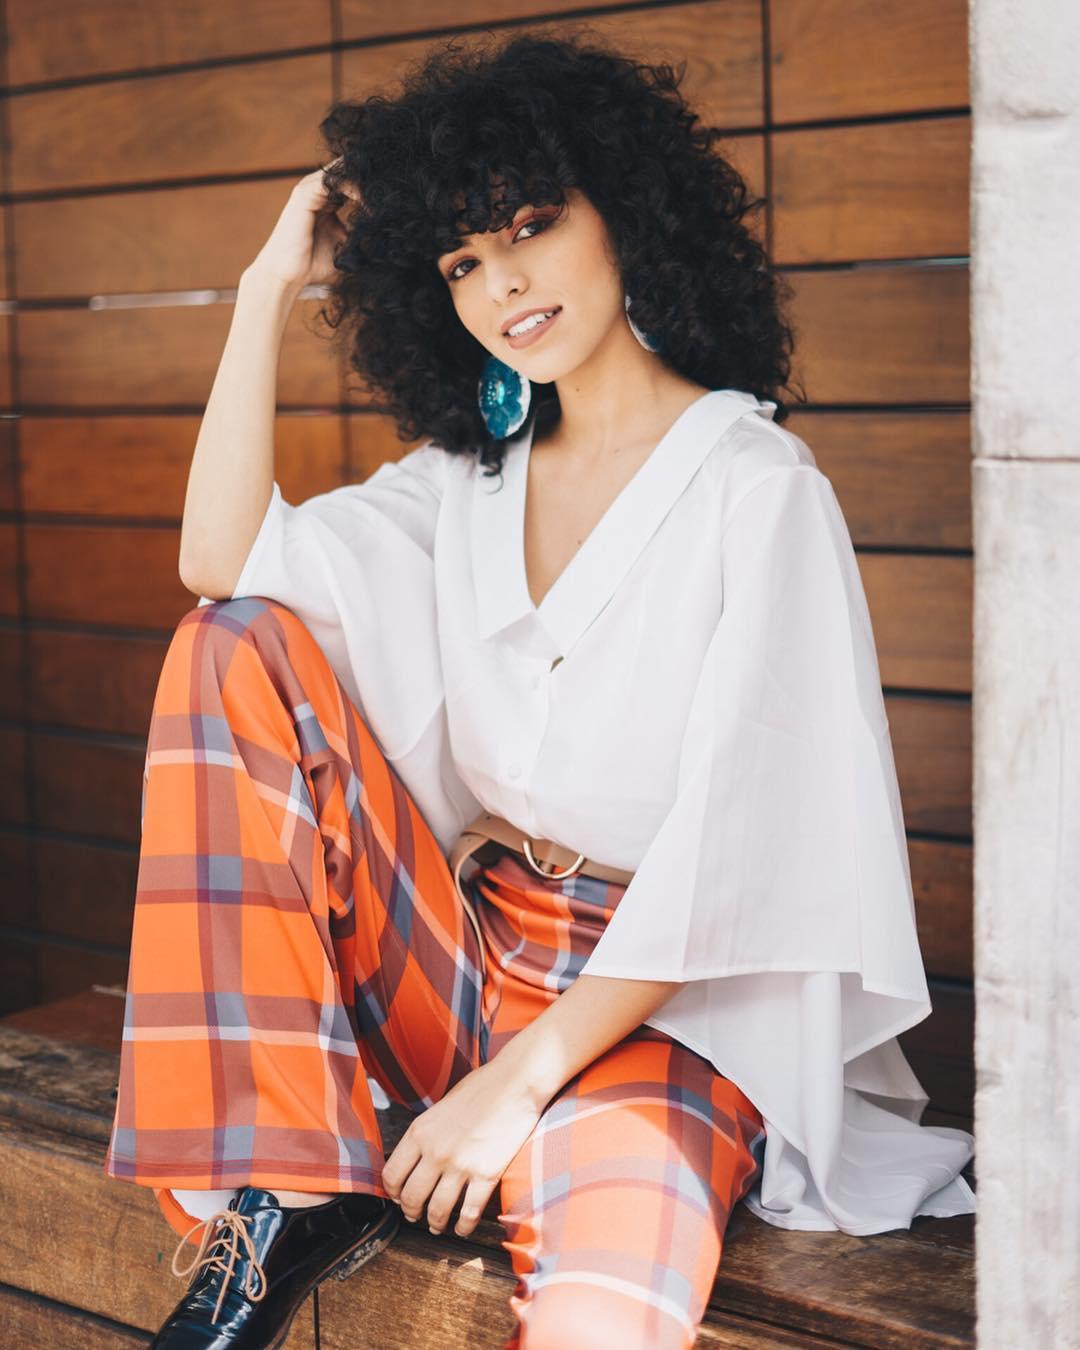 yuanilie alvarado, segunda finalista de reyna hispanoamericana 2019. 33175412